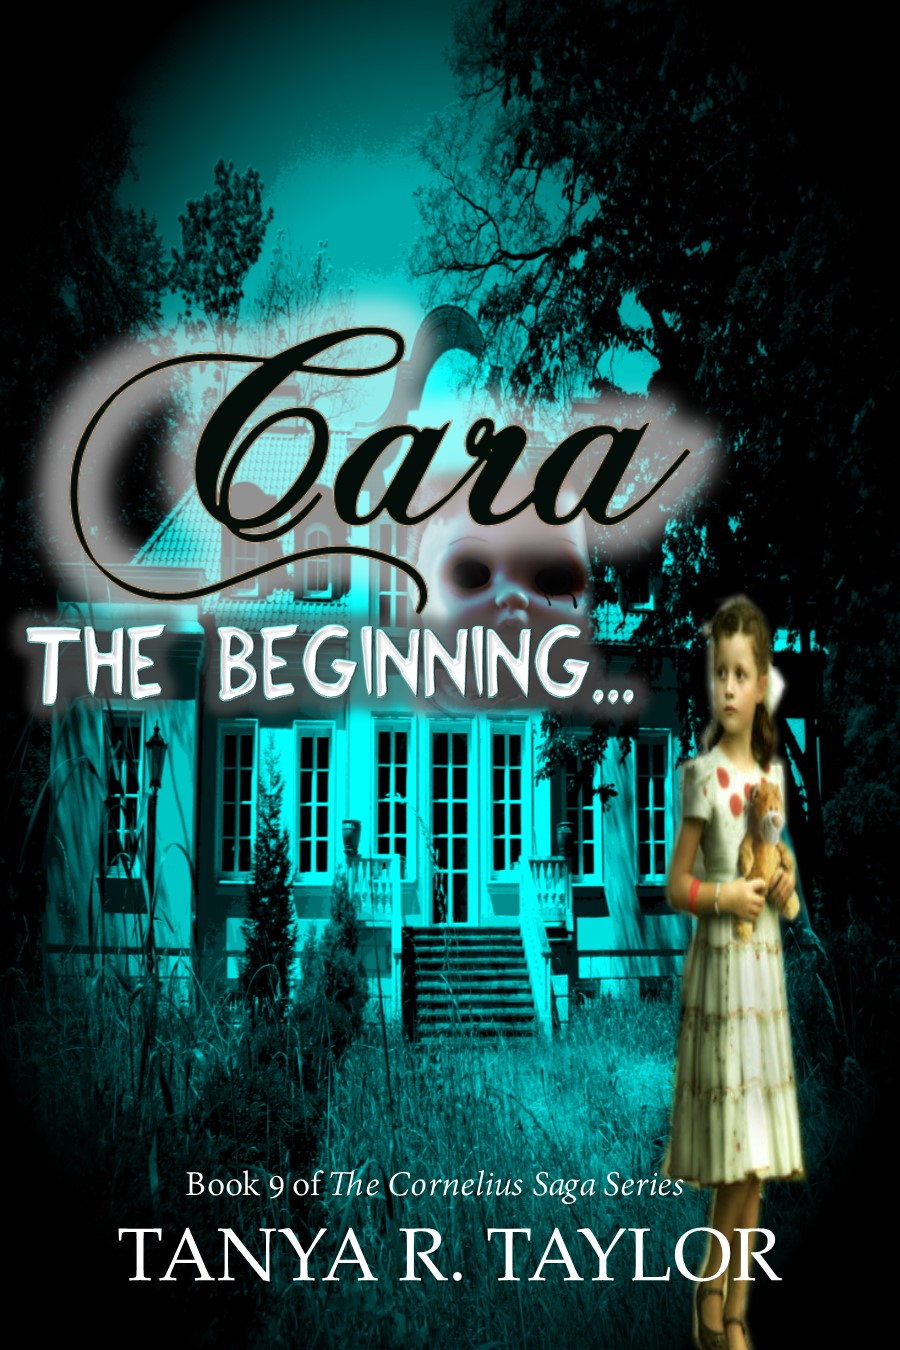 CARA (THE PREQUEL)2